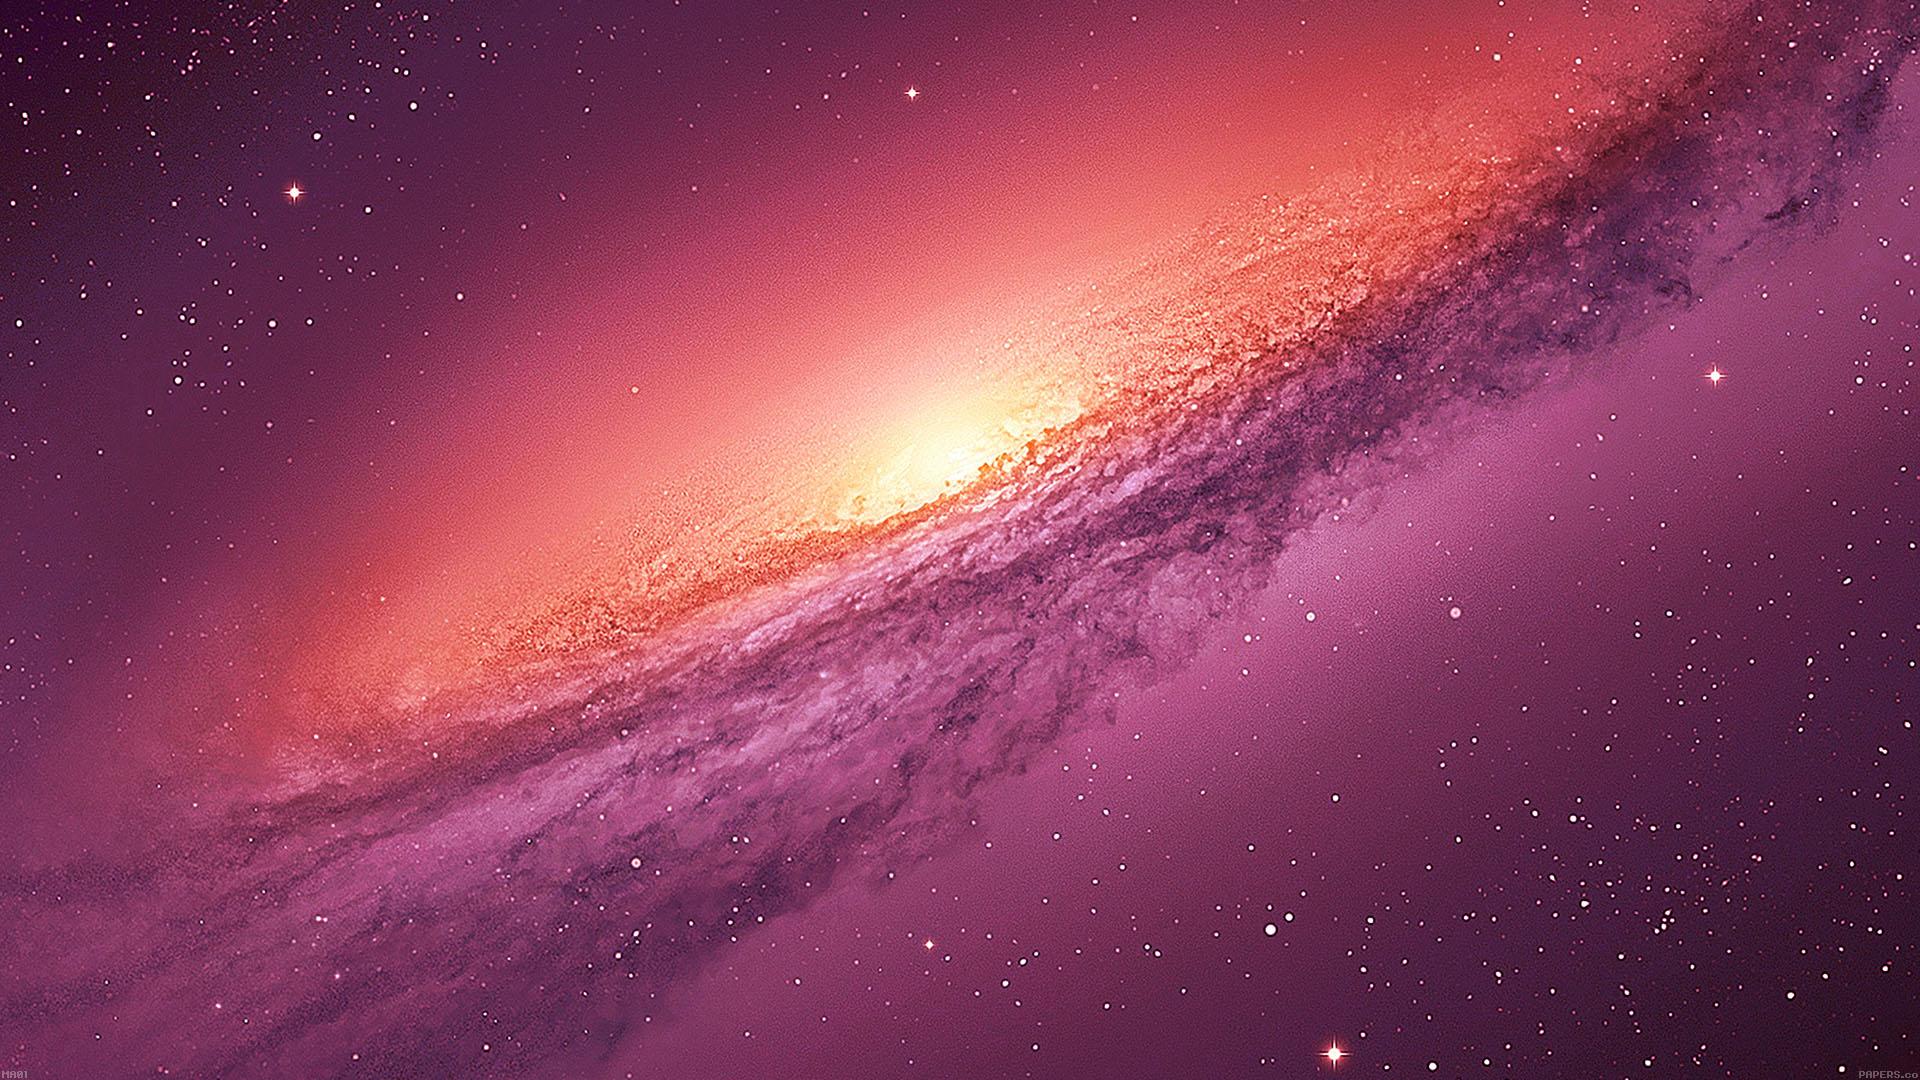 Best Wallpaper App For Iphone Wallpaper For Desktop Laptop Ma01 Purple Galaxy Space